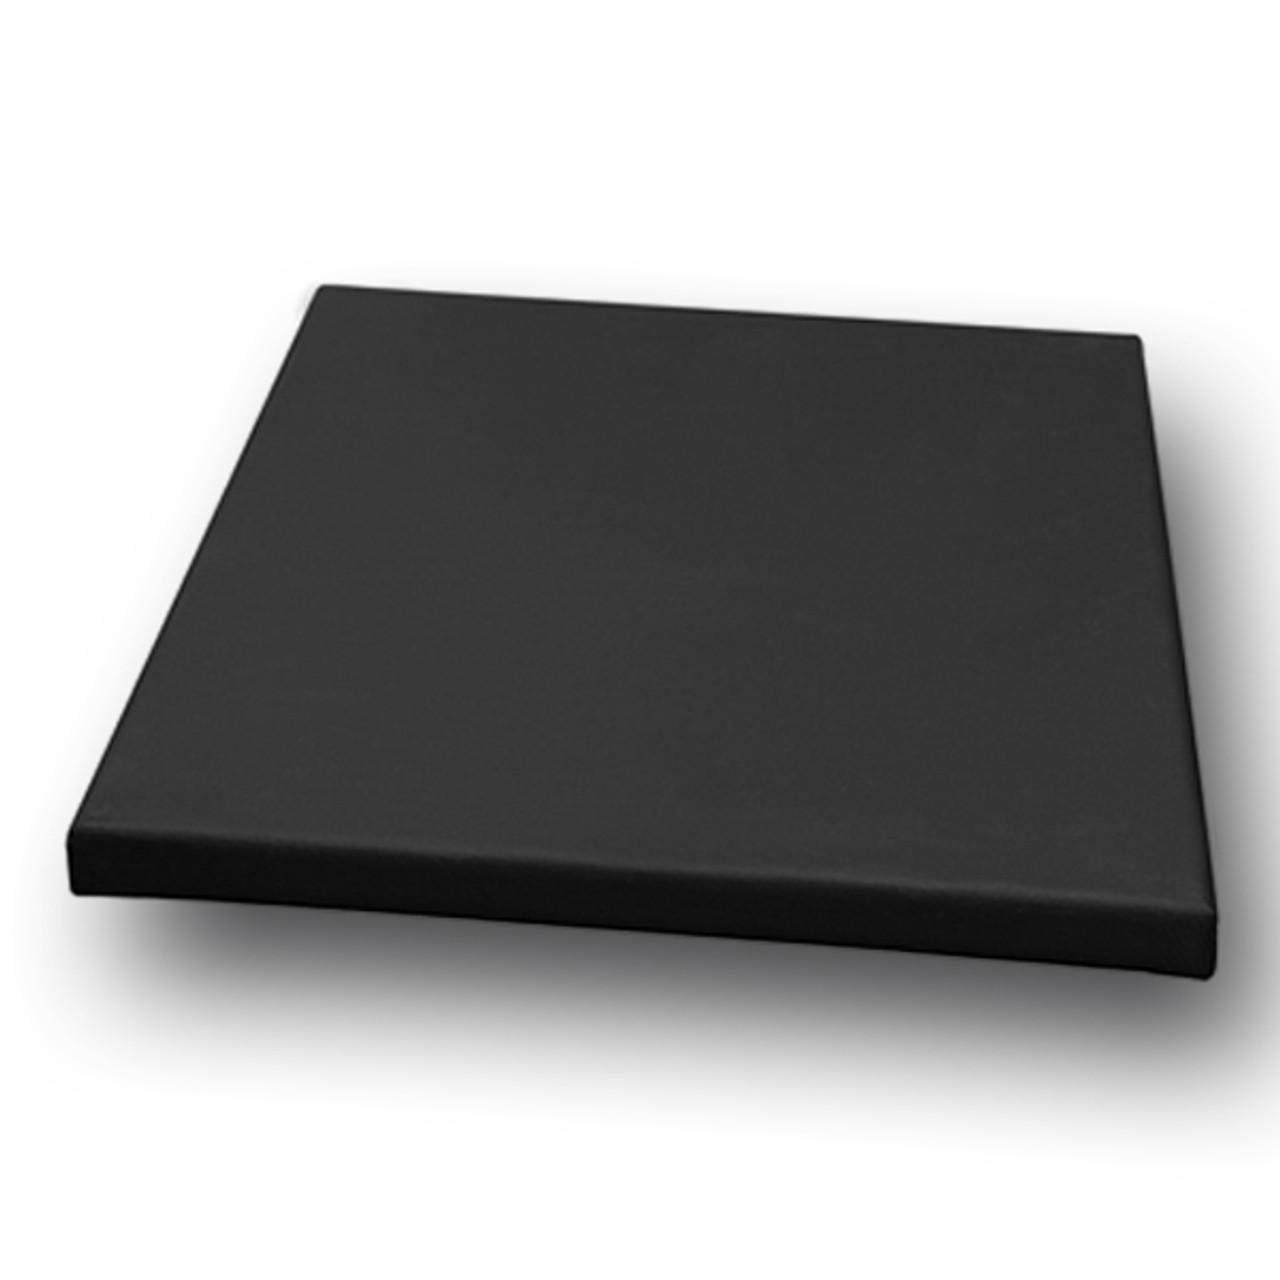 3 4 stretched black